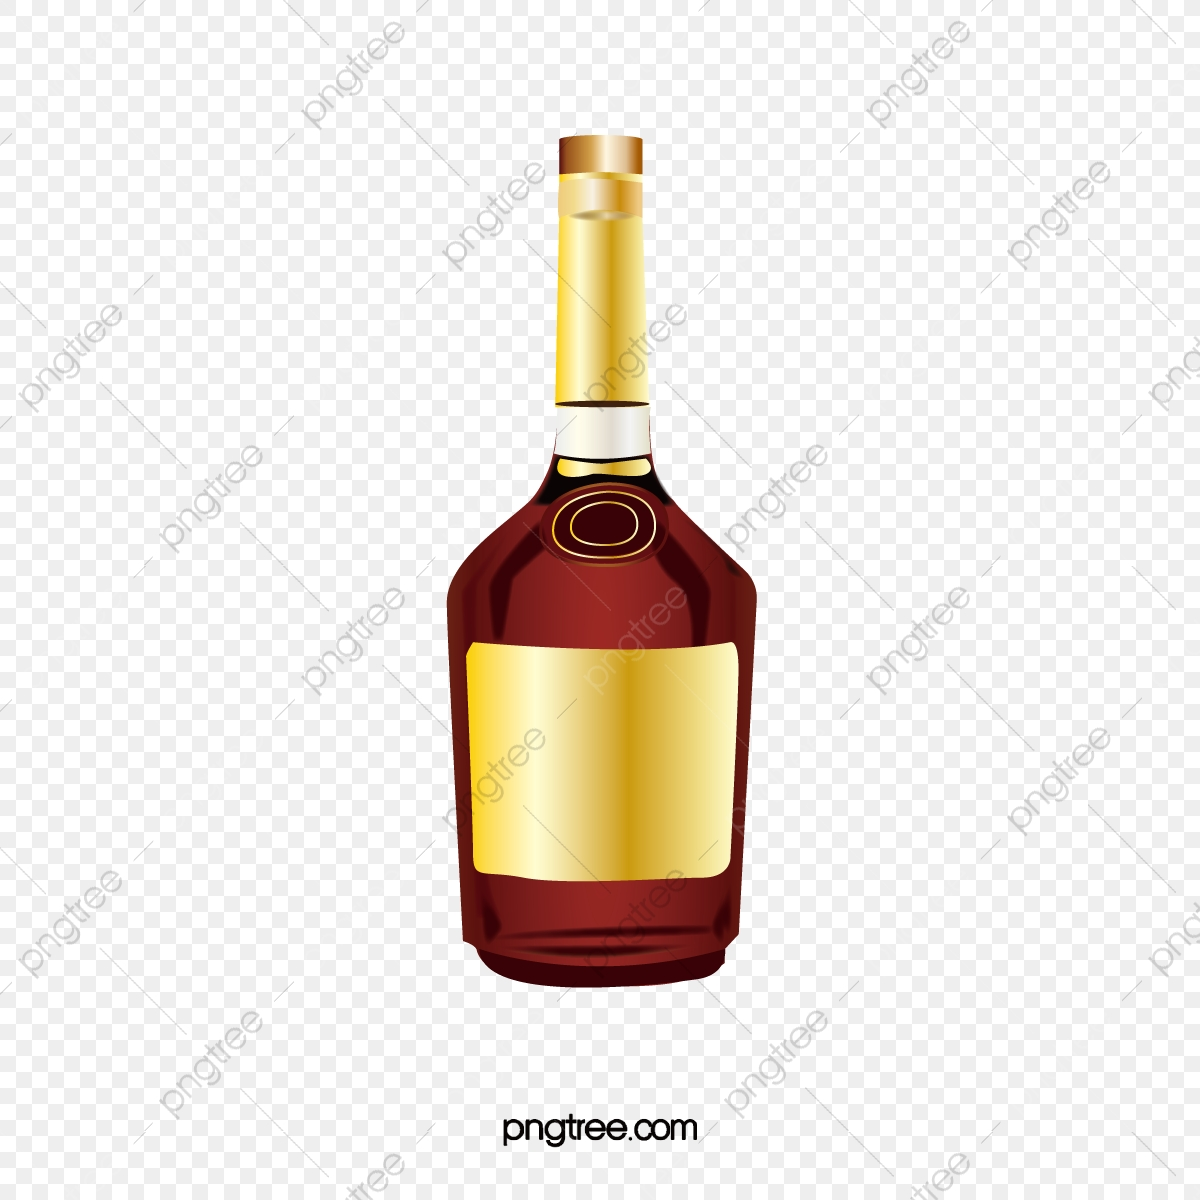 Xo Cognac Wine Material Free Download, Wine Clipart, Cognac, Red.